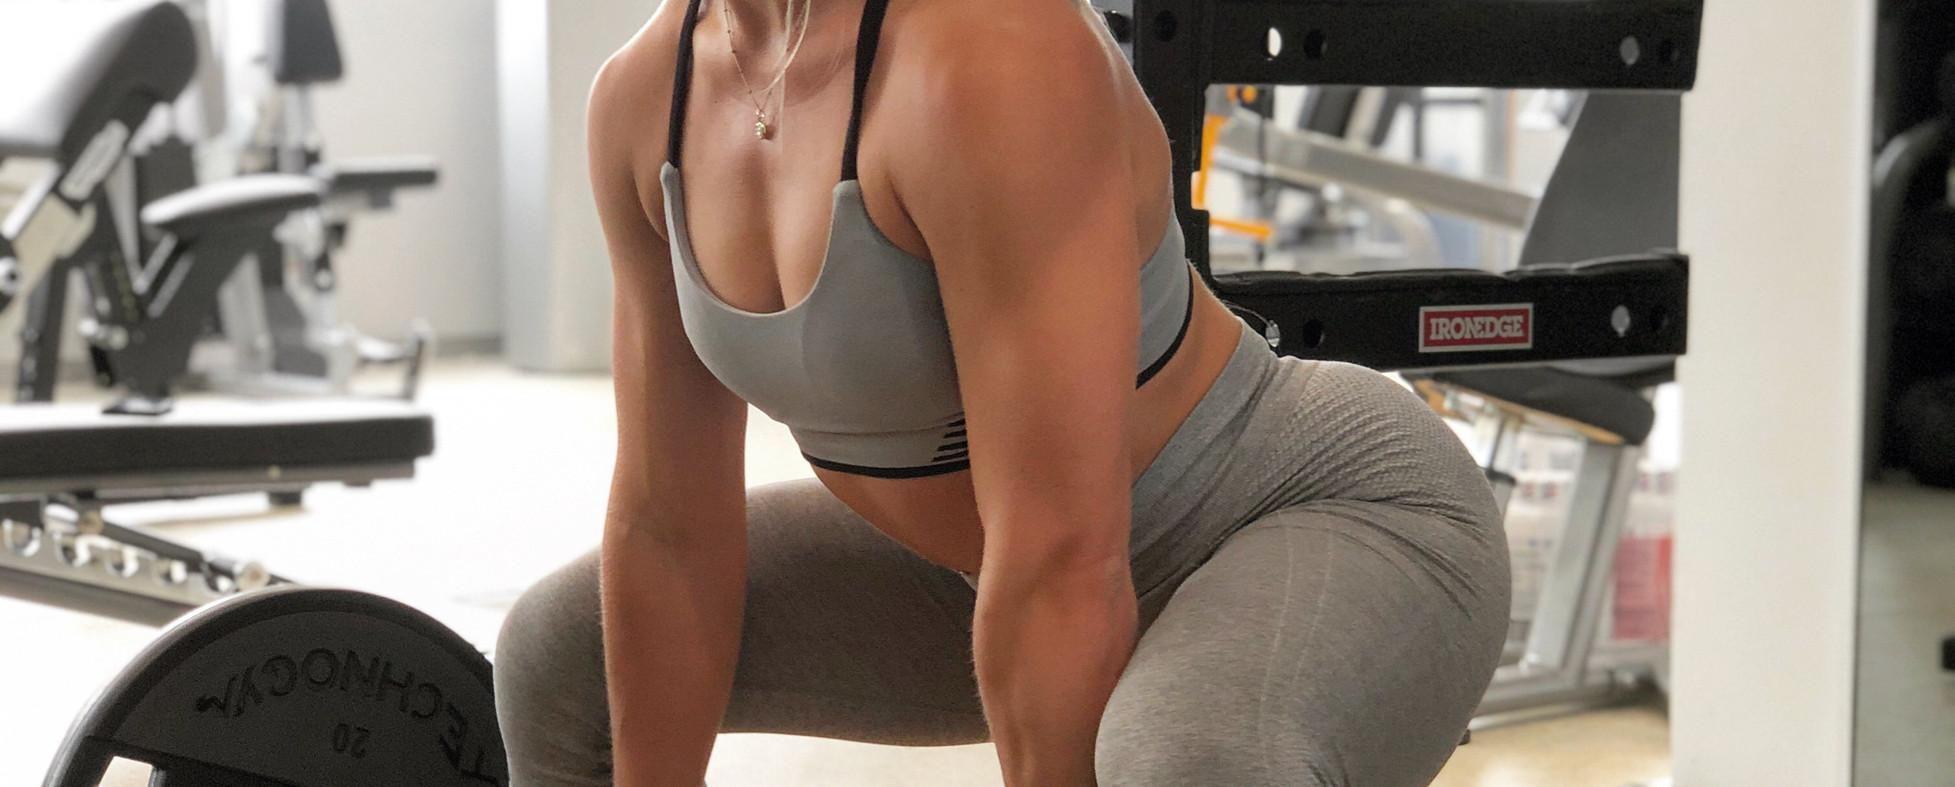 Sophie Dakin Personal trainer Studio Ath